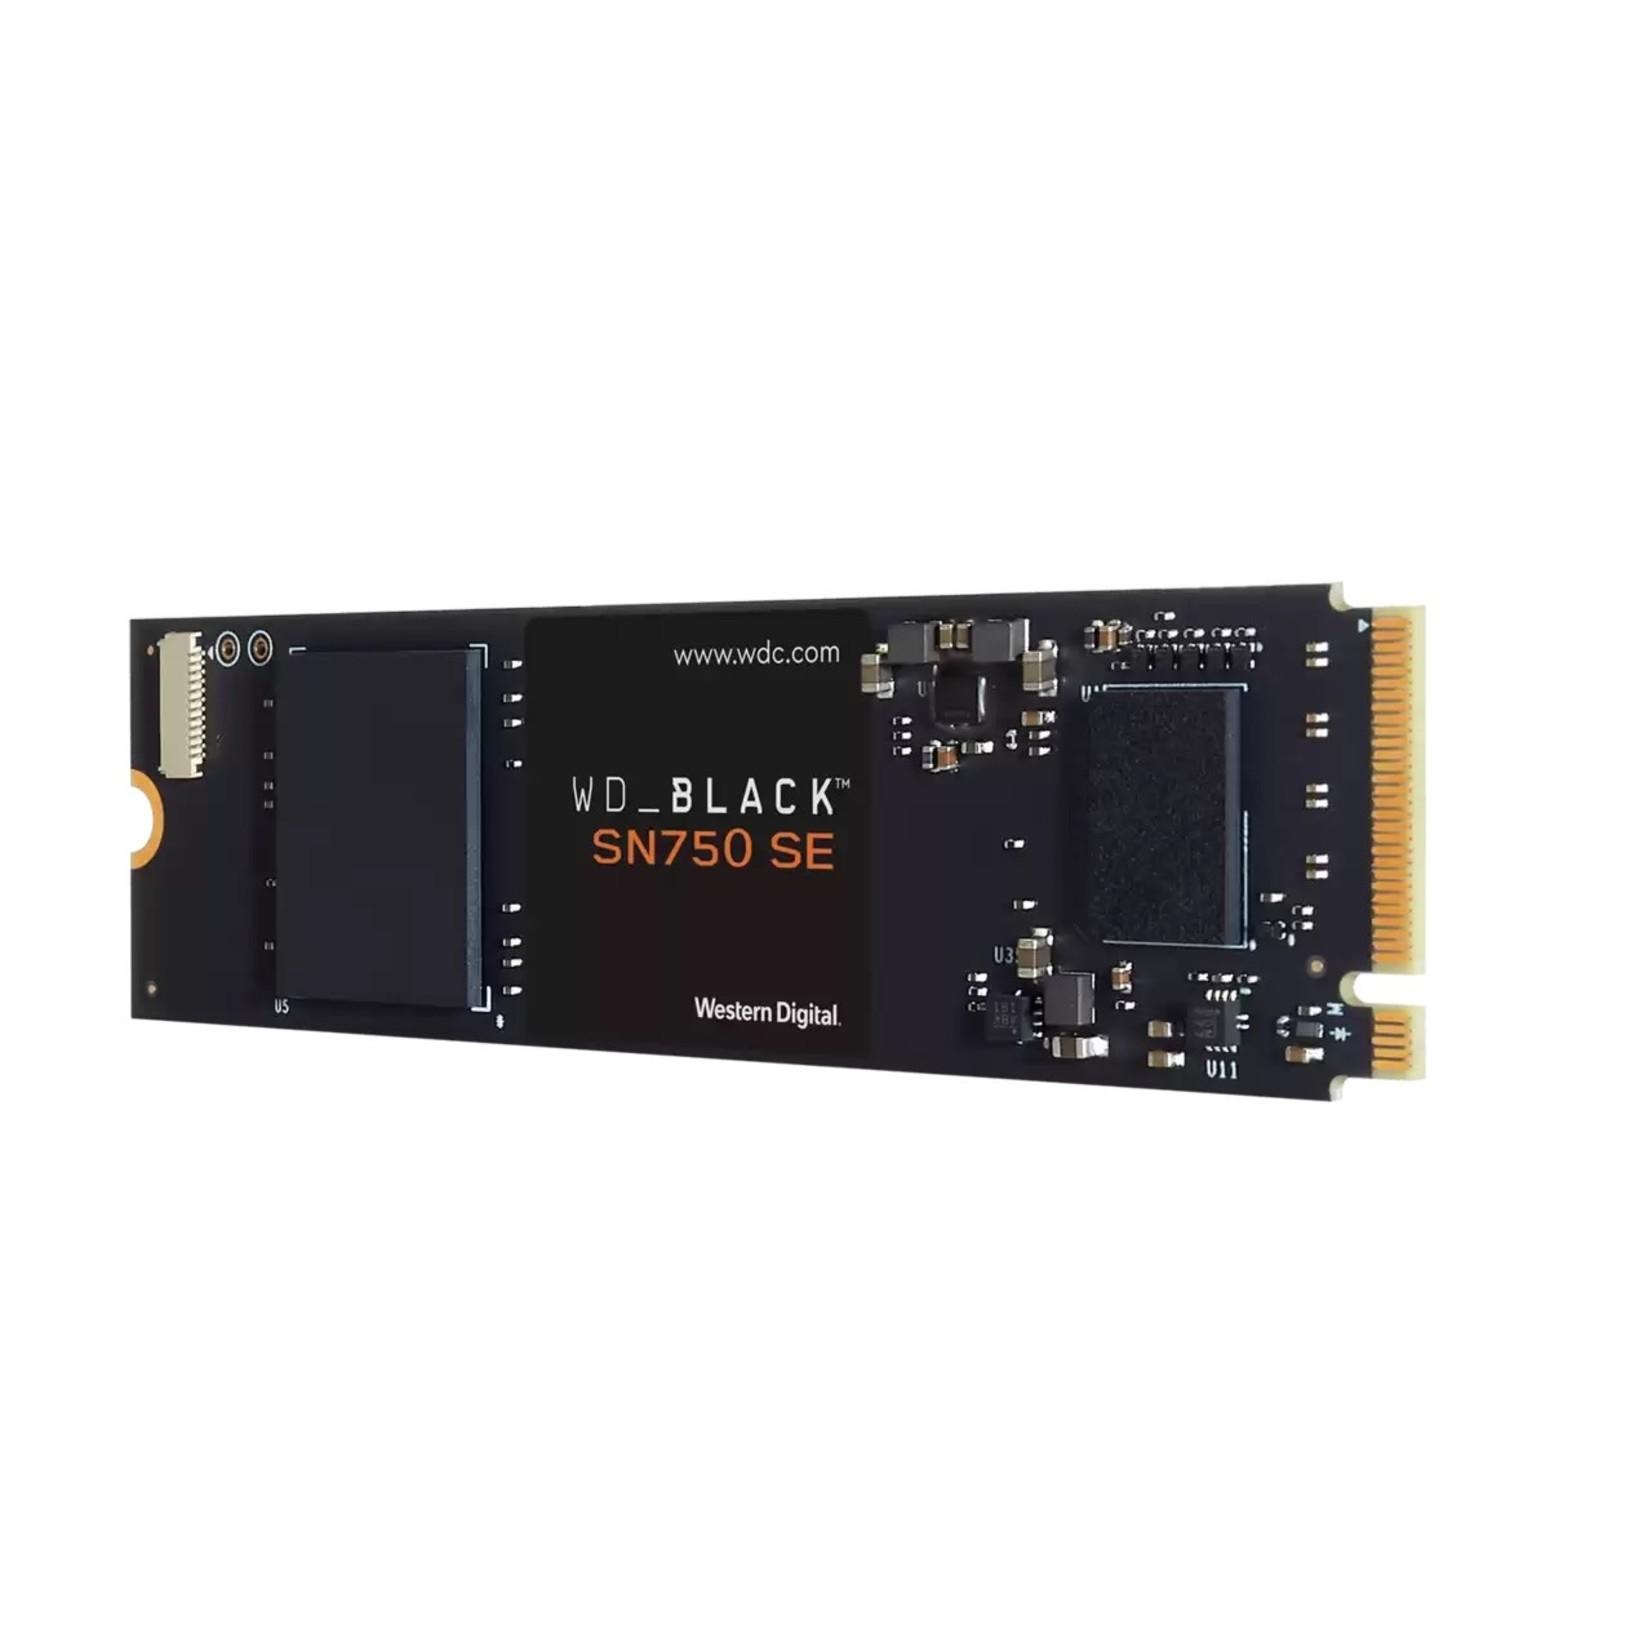 Western Digital WD Black SN750 SE NVMe 500GB SSD